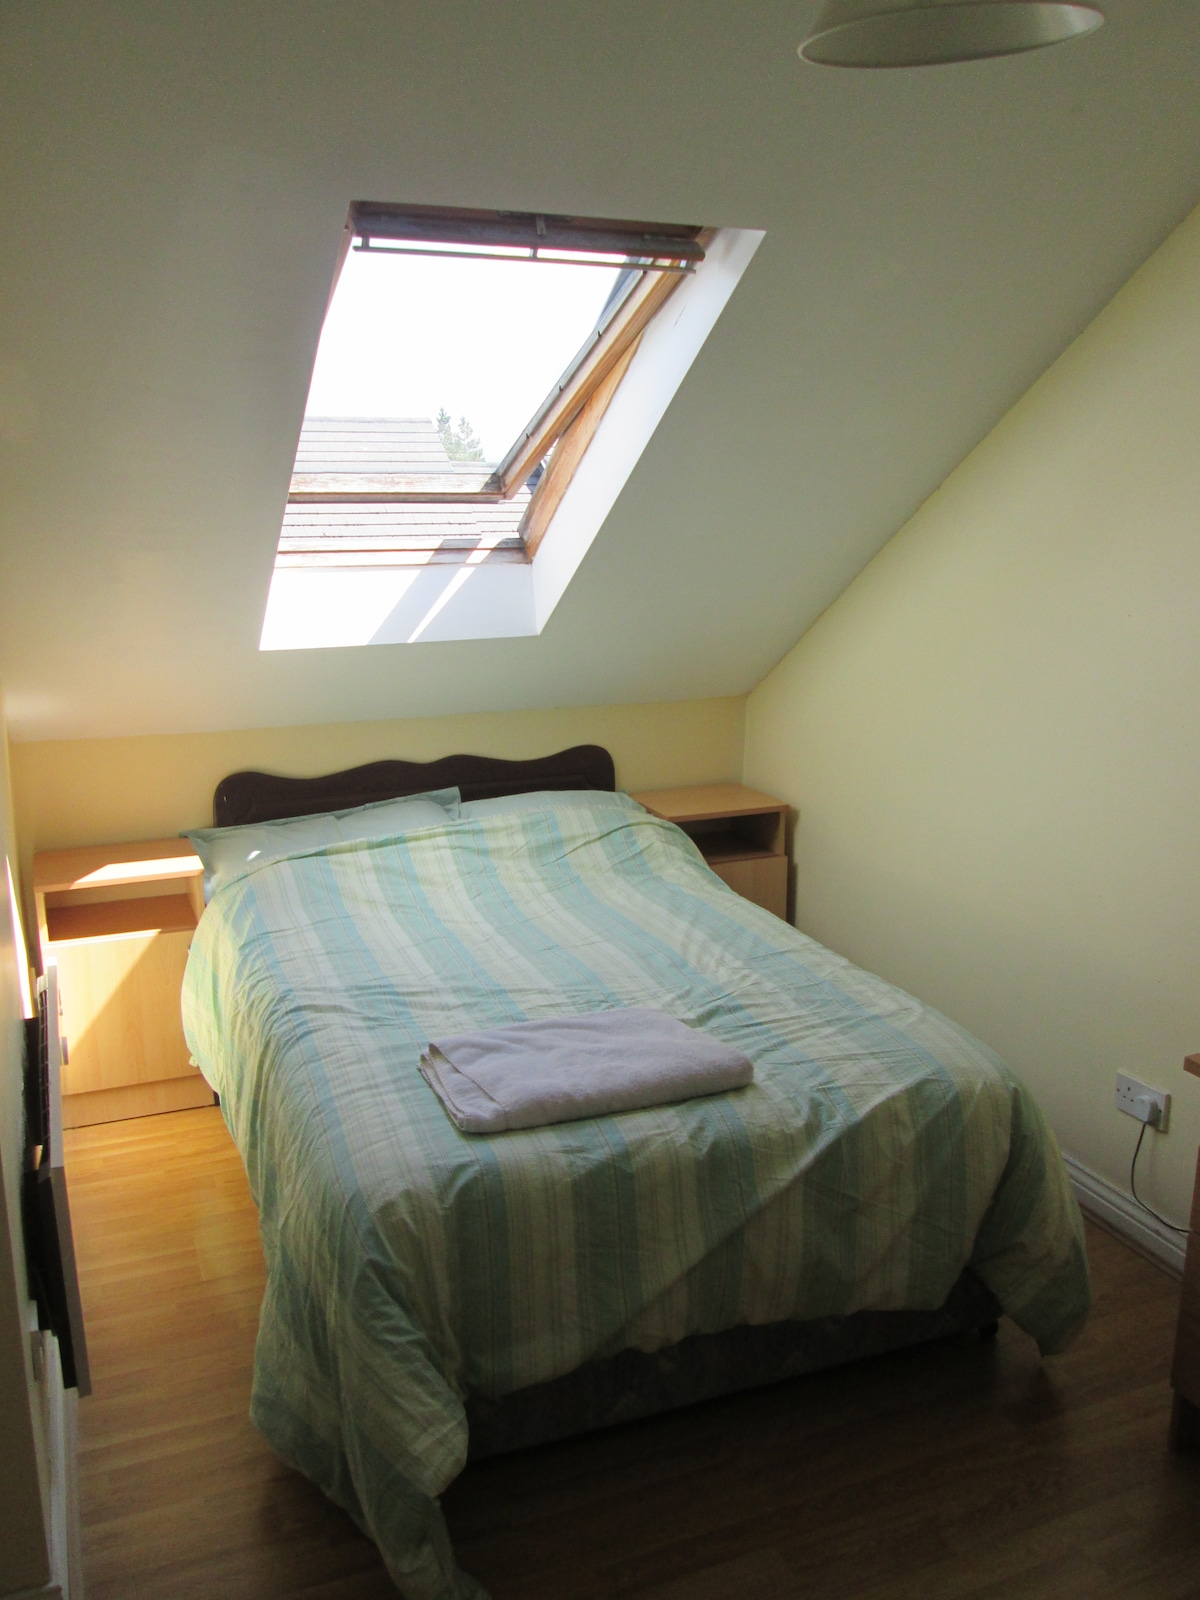 Ensuite bedroom in Salthill